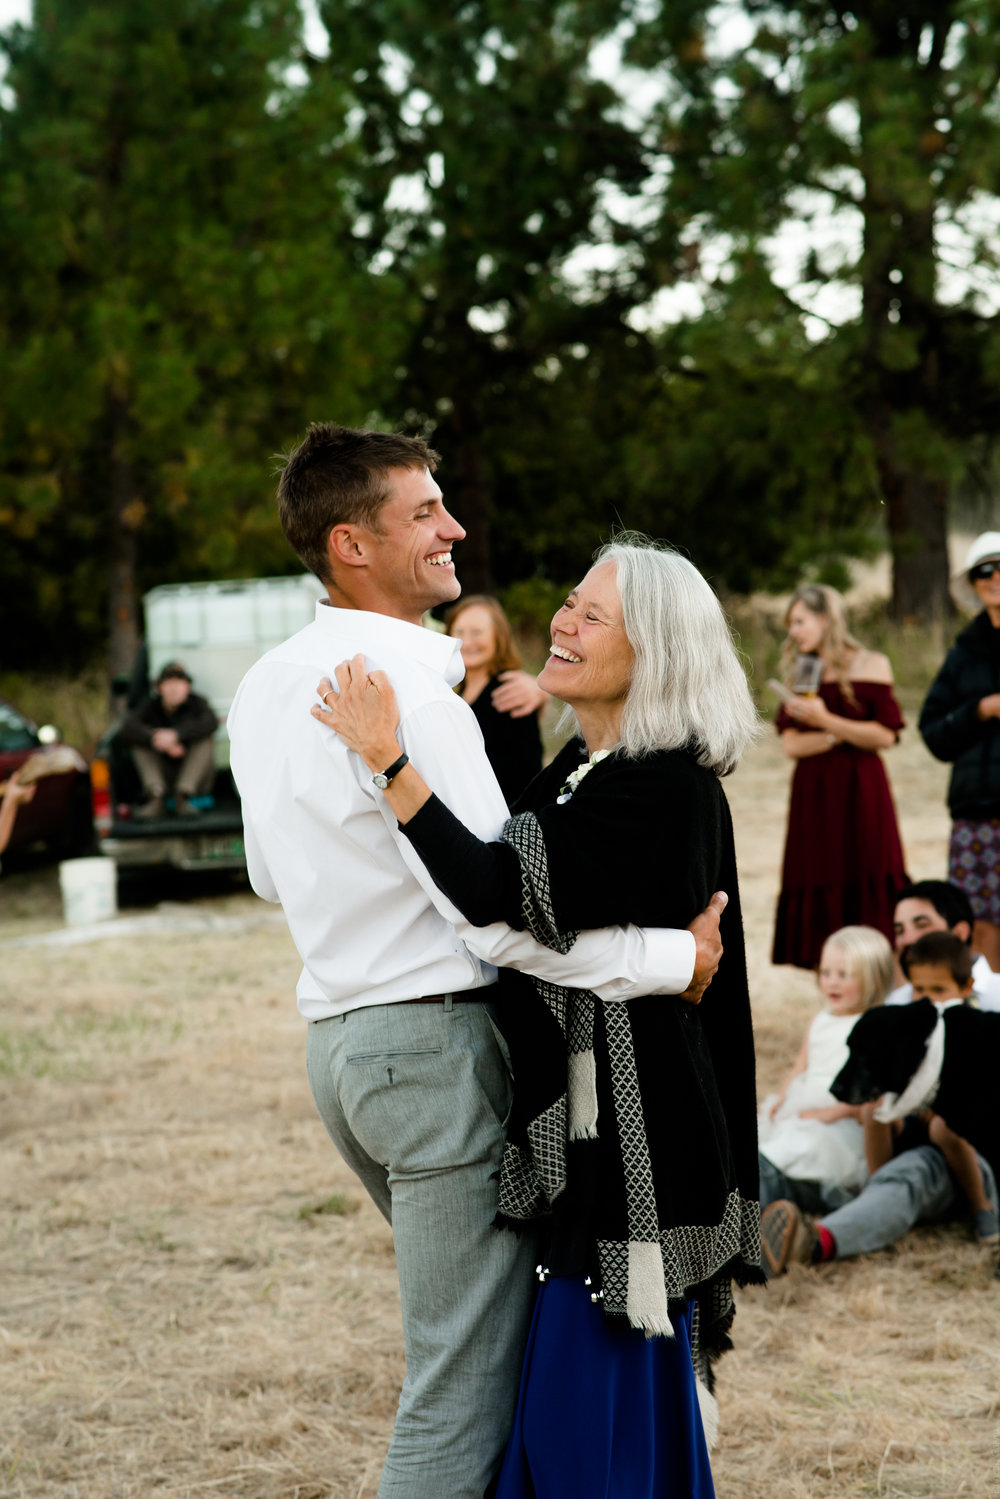 Lana Micah Wedding La Grande Oregon September 2018 Please Credit Talia Jean Galvin (520 of 687).jpg